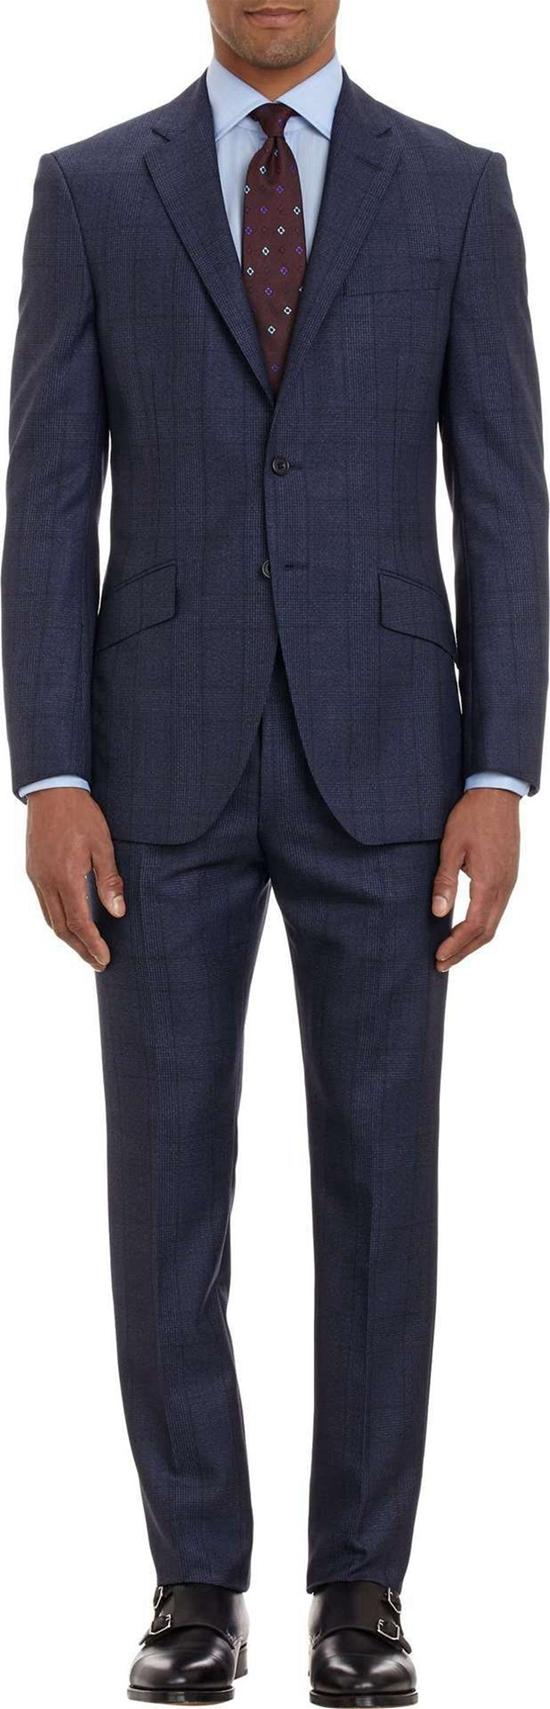 Slim Fit Tuxedo Men Suit 100%wool Men's Custom Suits Fashion Coat ...